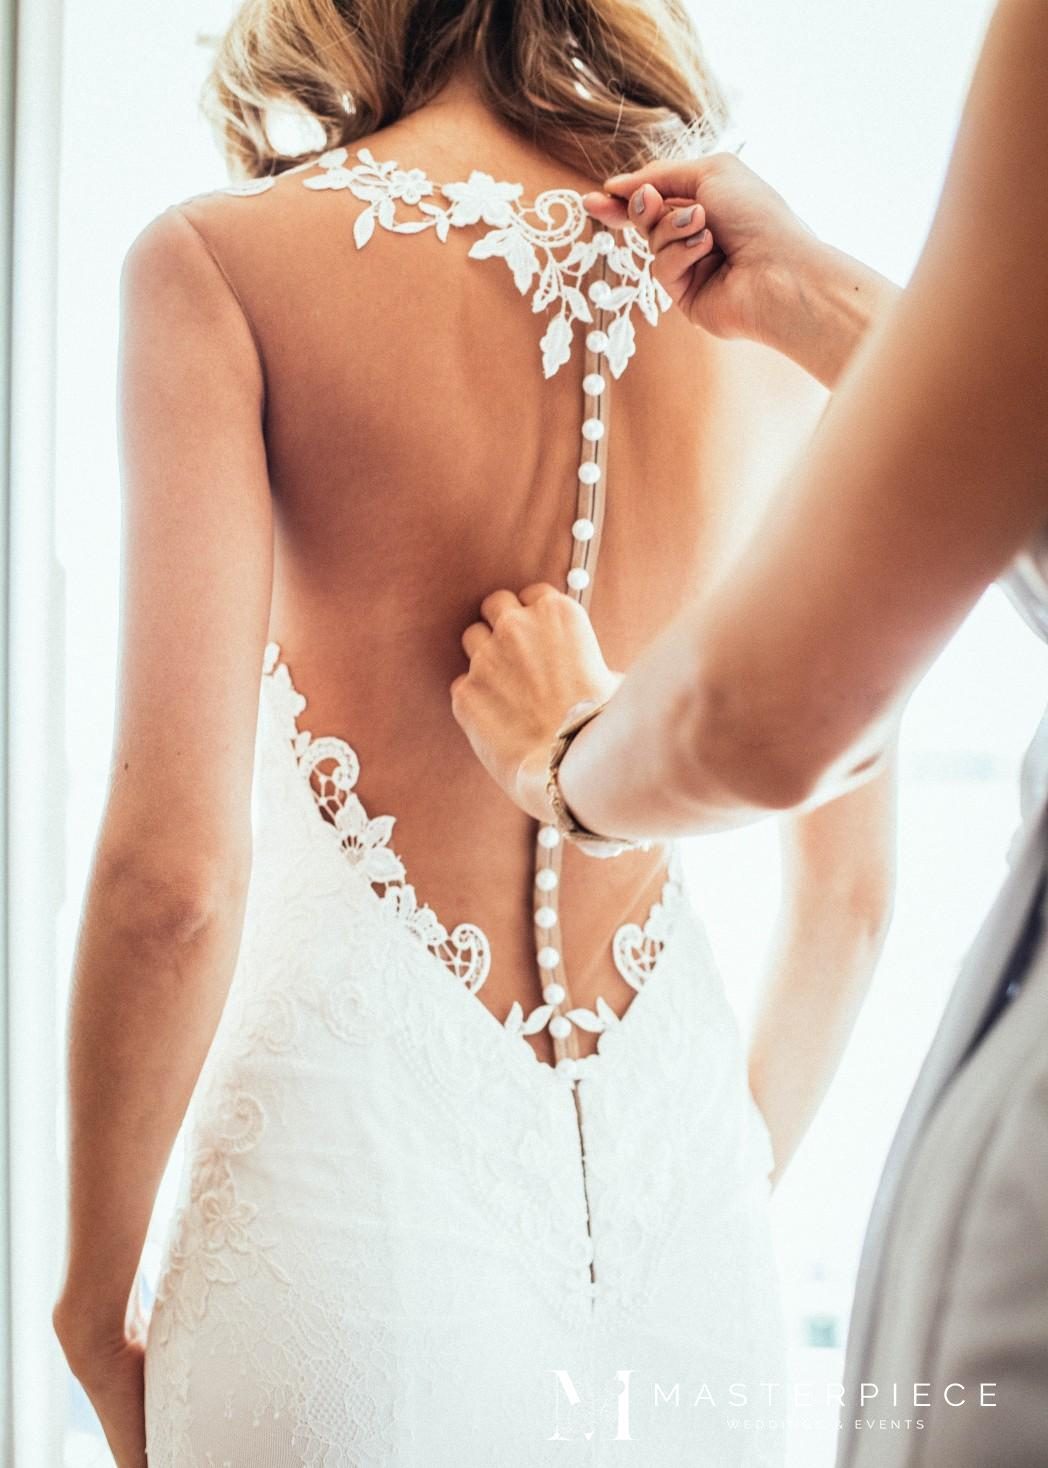 Masterpiece_Weddings_sluby_059